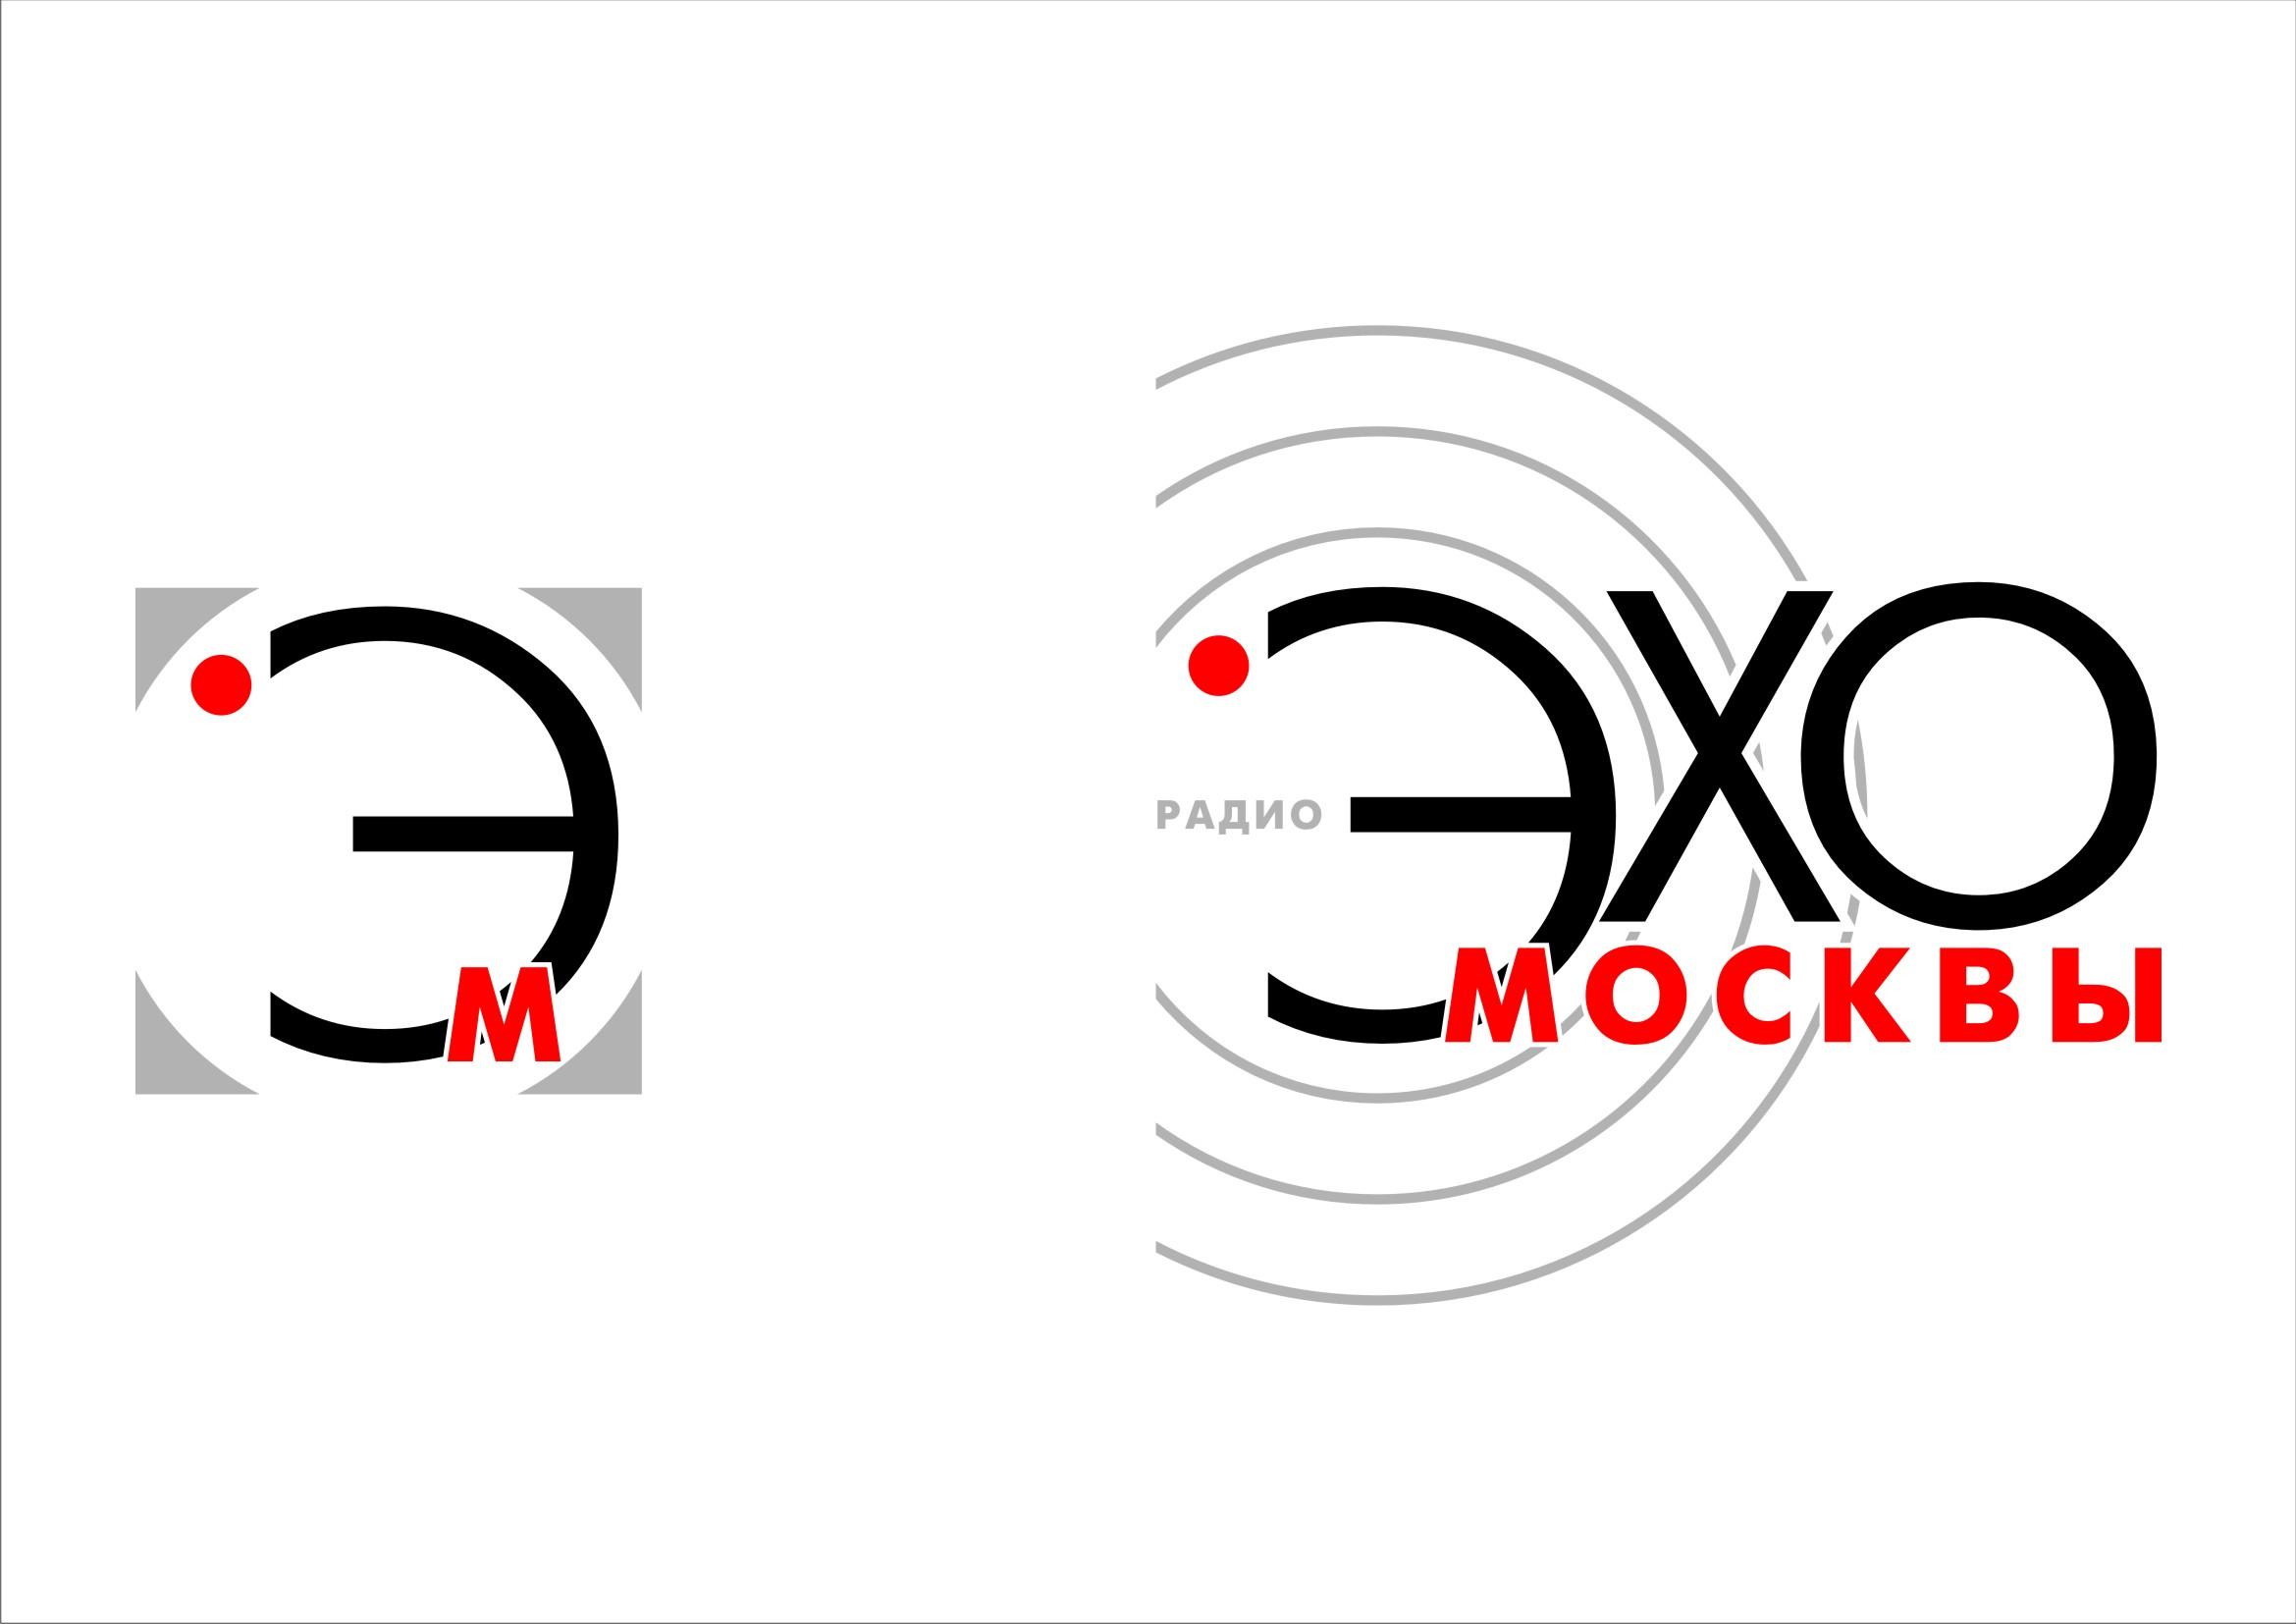 Дизайн логотипа р/с Эхо Москвы. фото f_11756221f5494b19.jpg